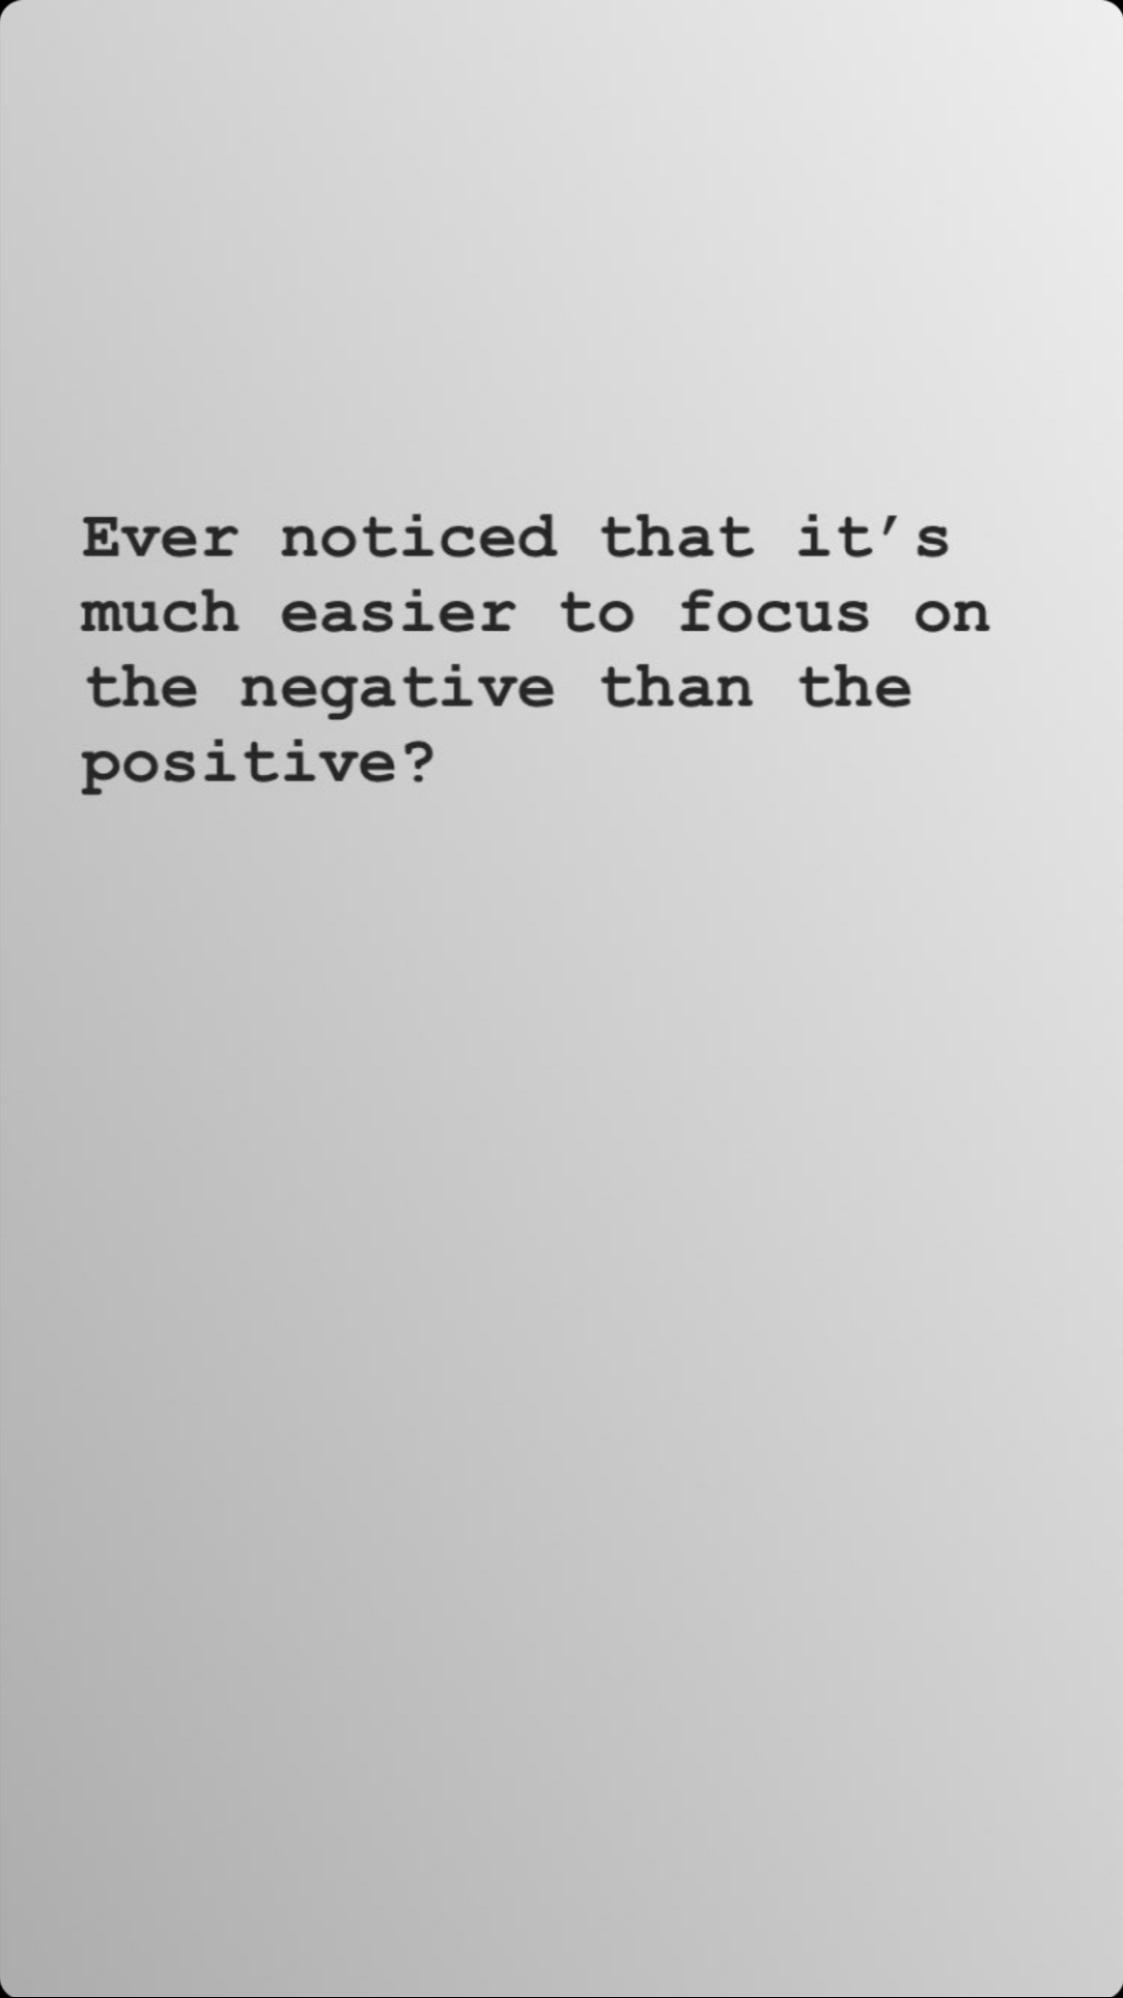 Negativity Bias